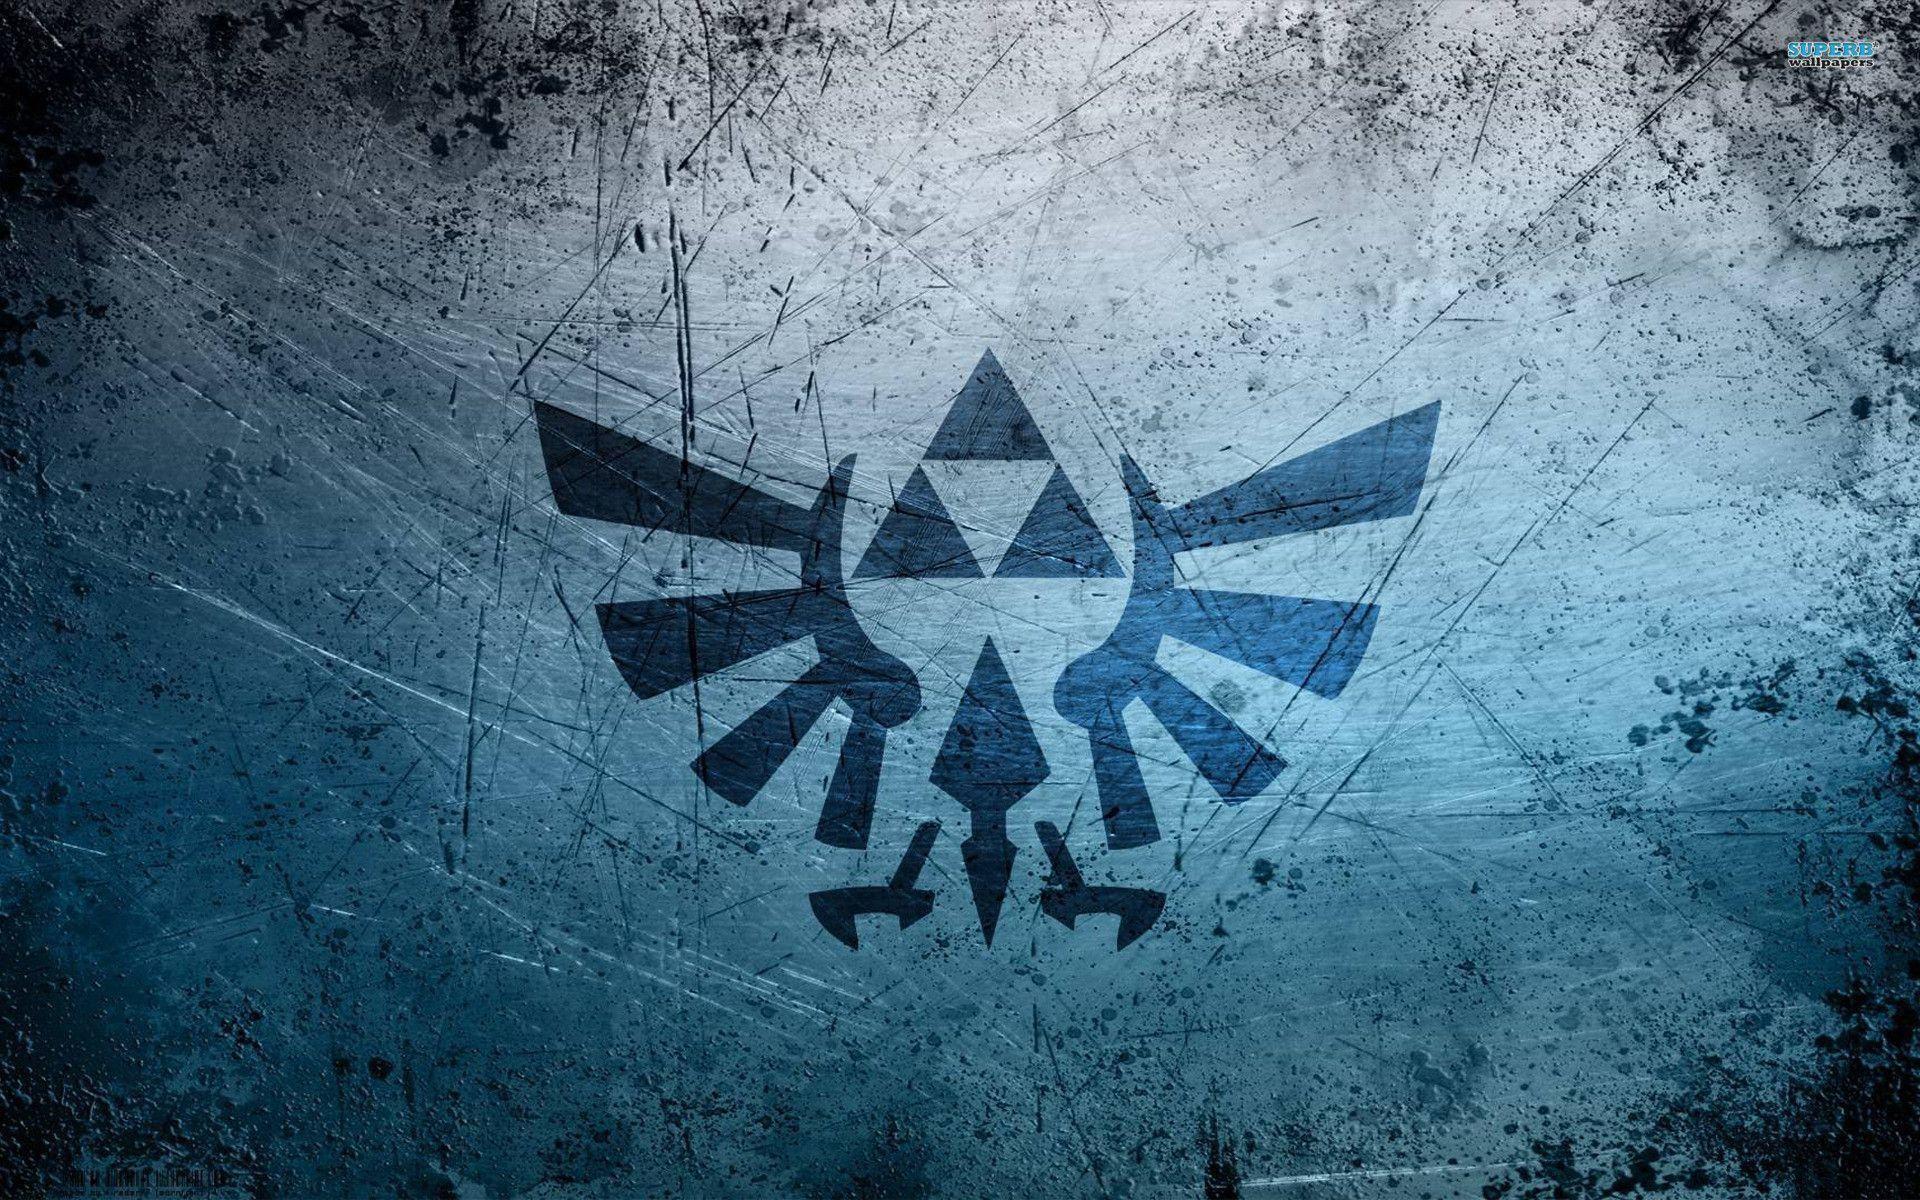 Legend Of Zelda Wallpapers – Full HD wallpaper search – page 7